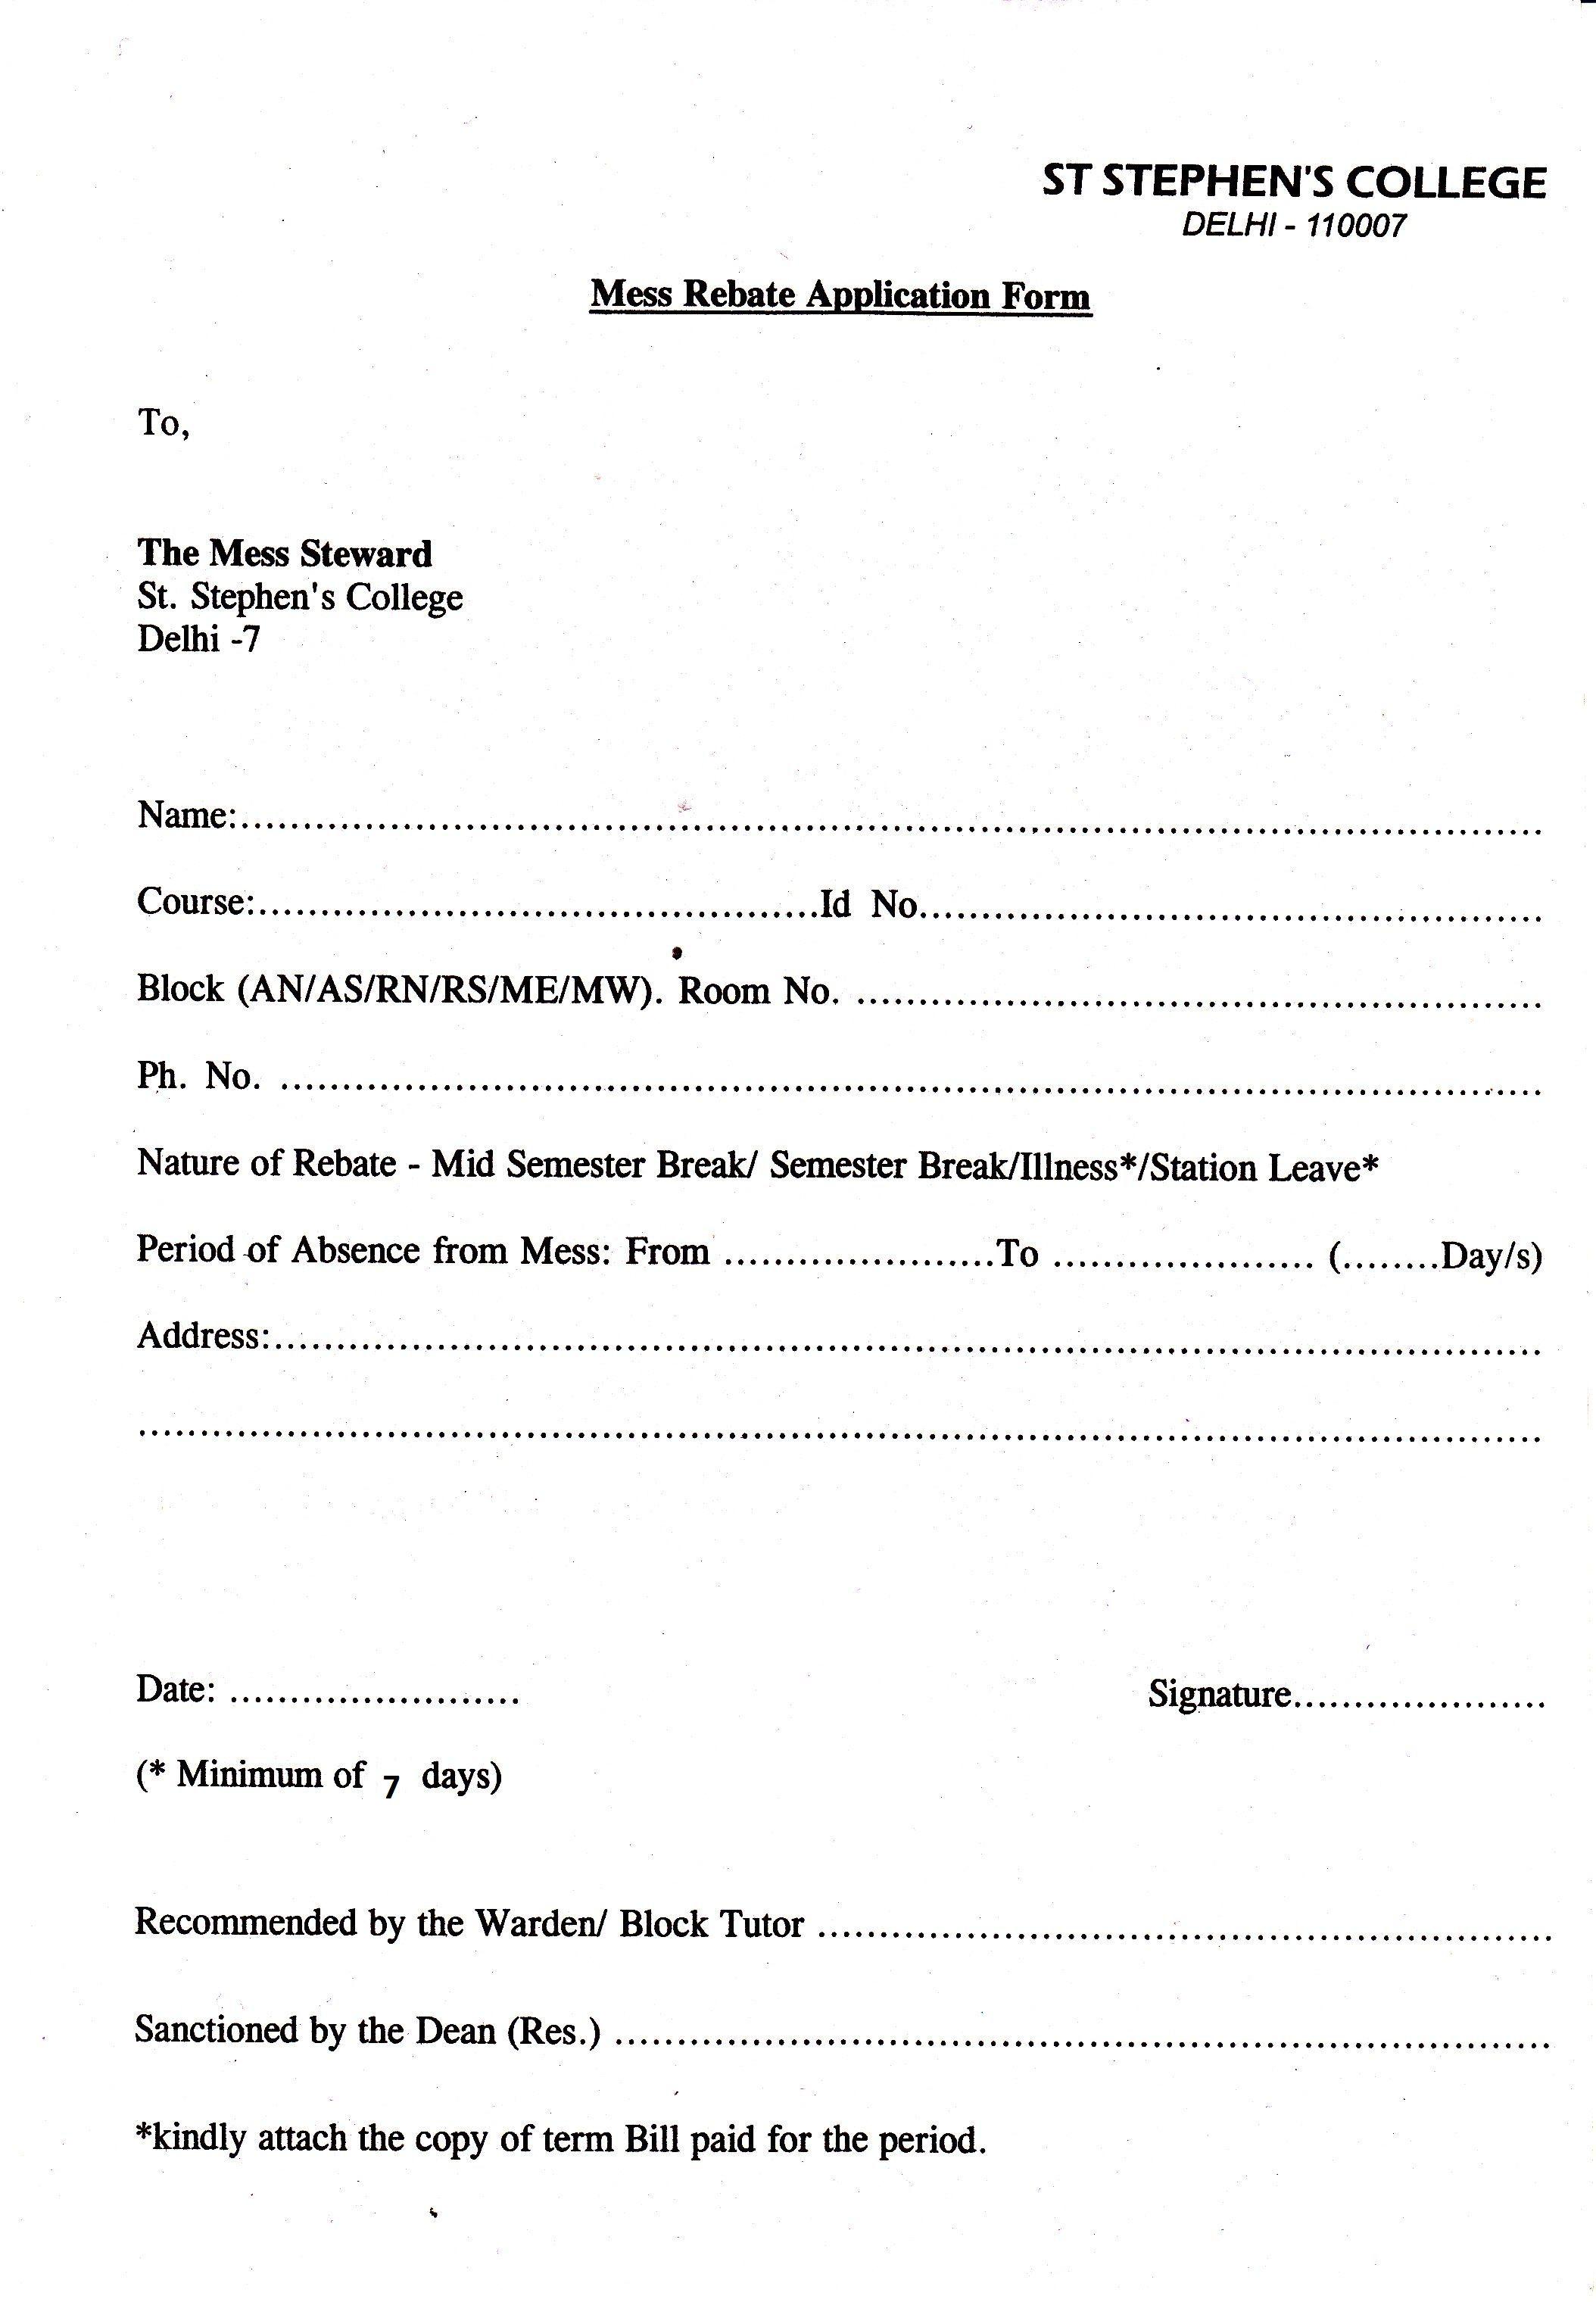 leave application form for office catering assistant sample resume – Sample Medical Application Form